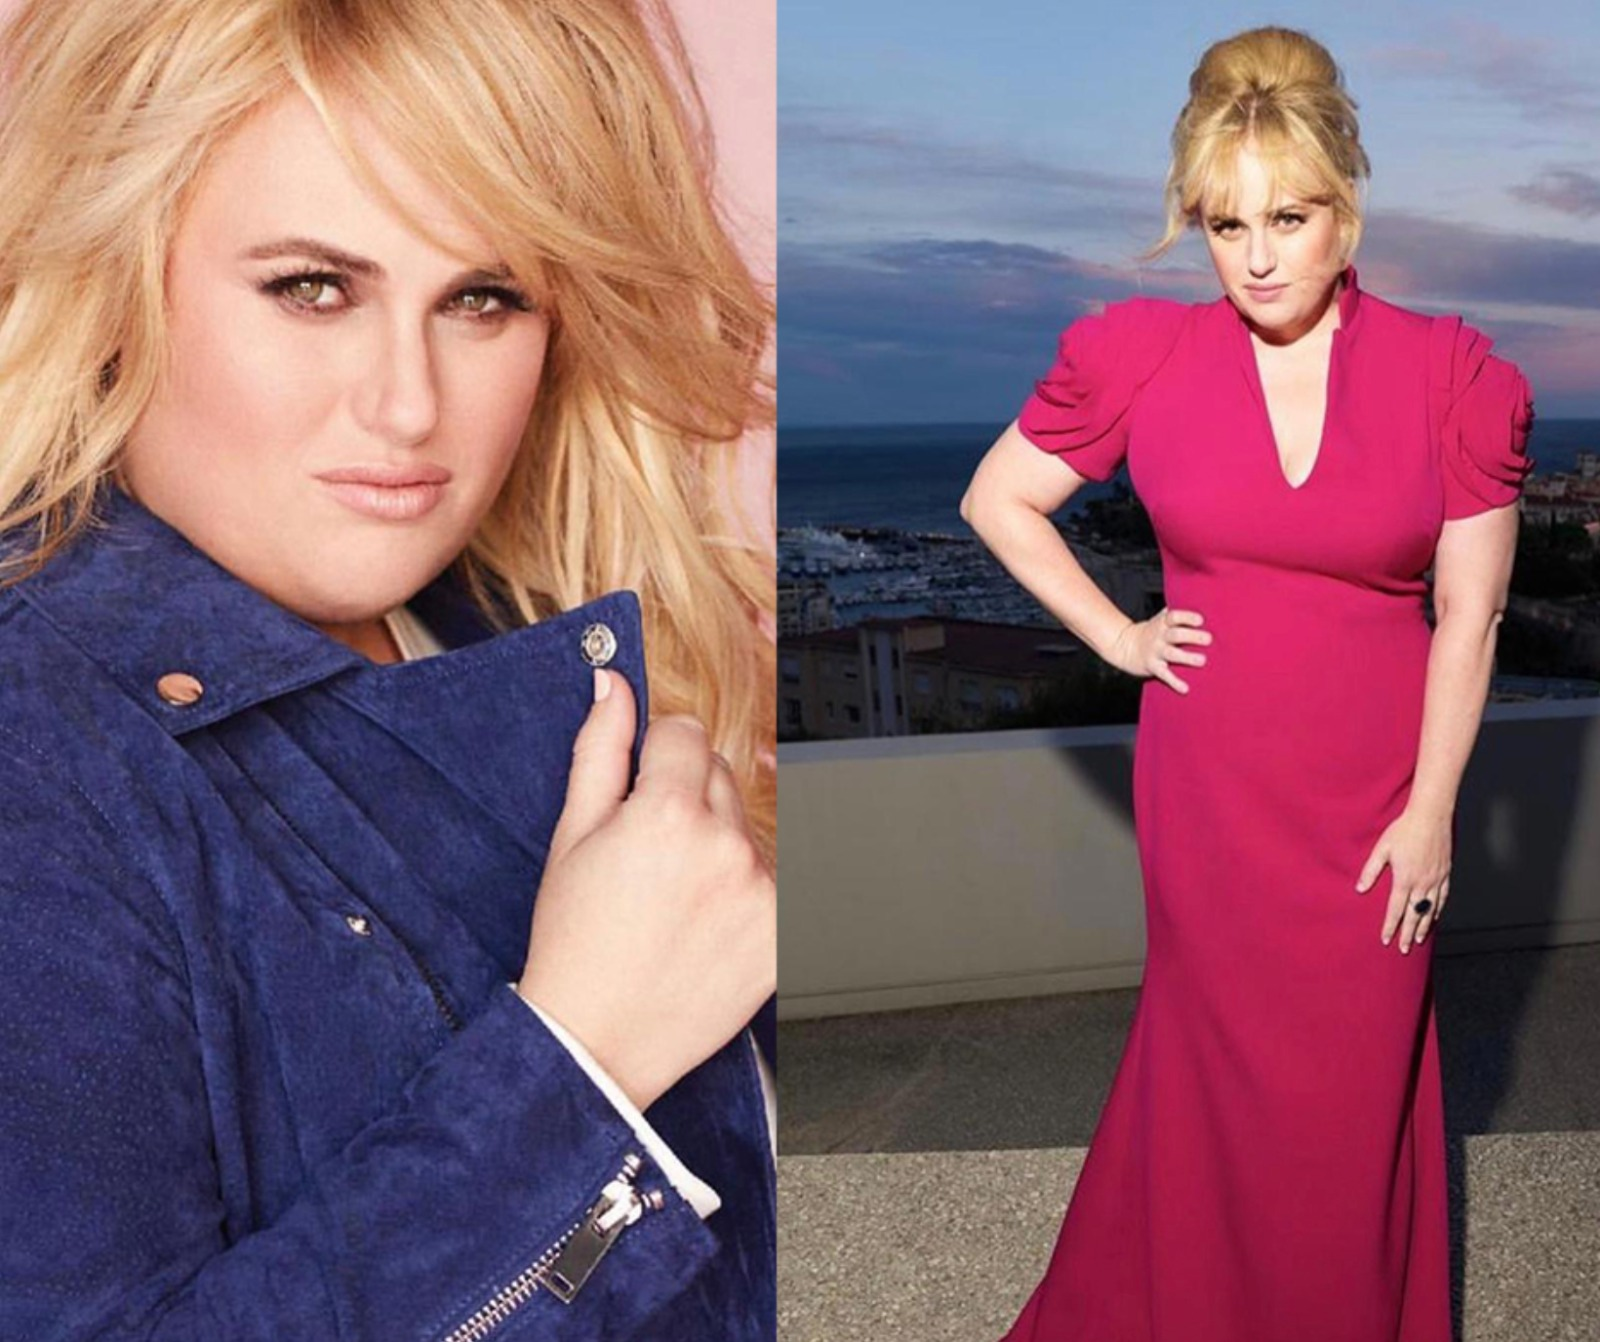 rebel wilson attrice dimagrita quanti chili perso